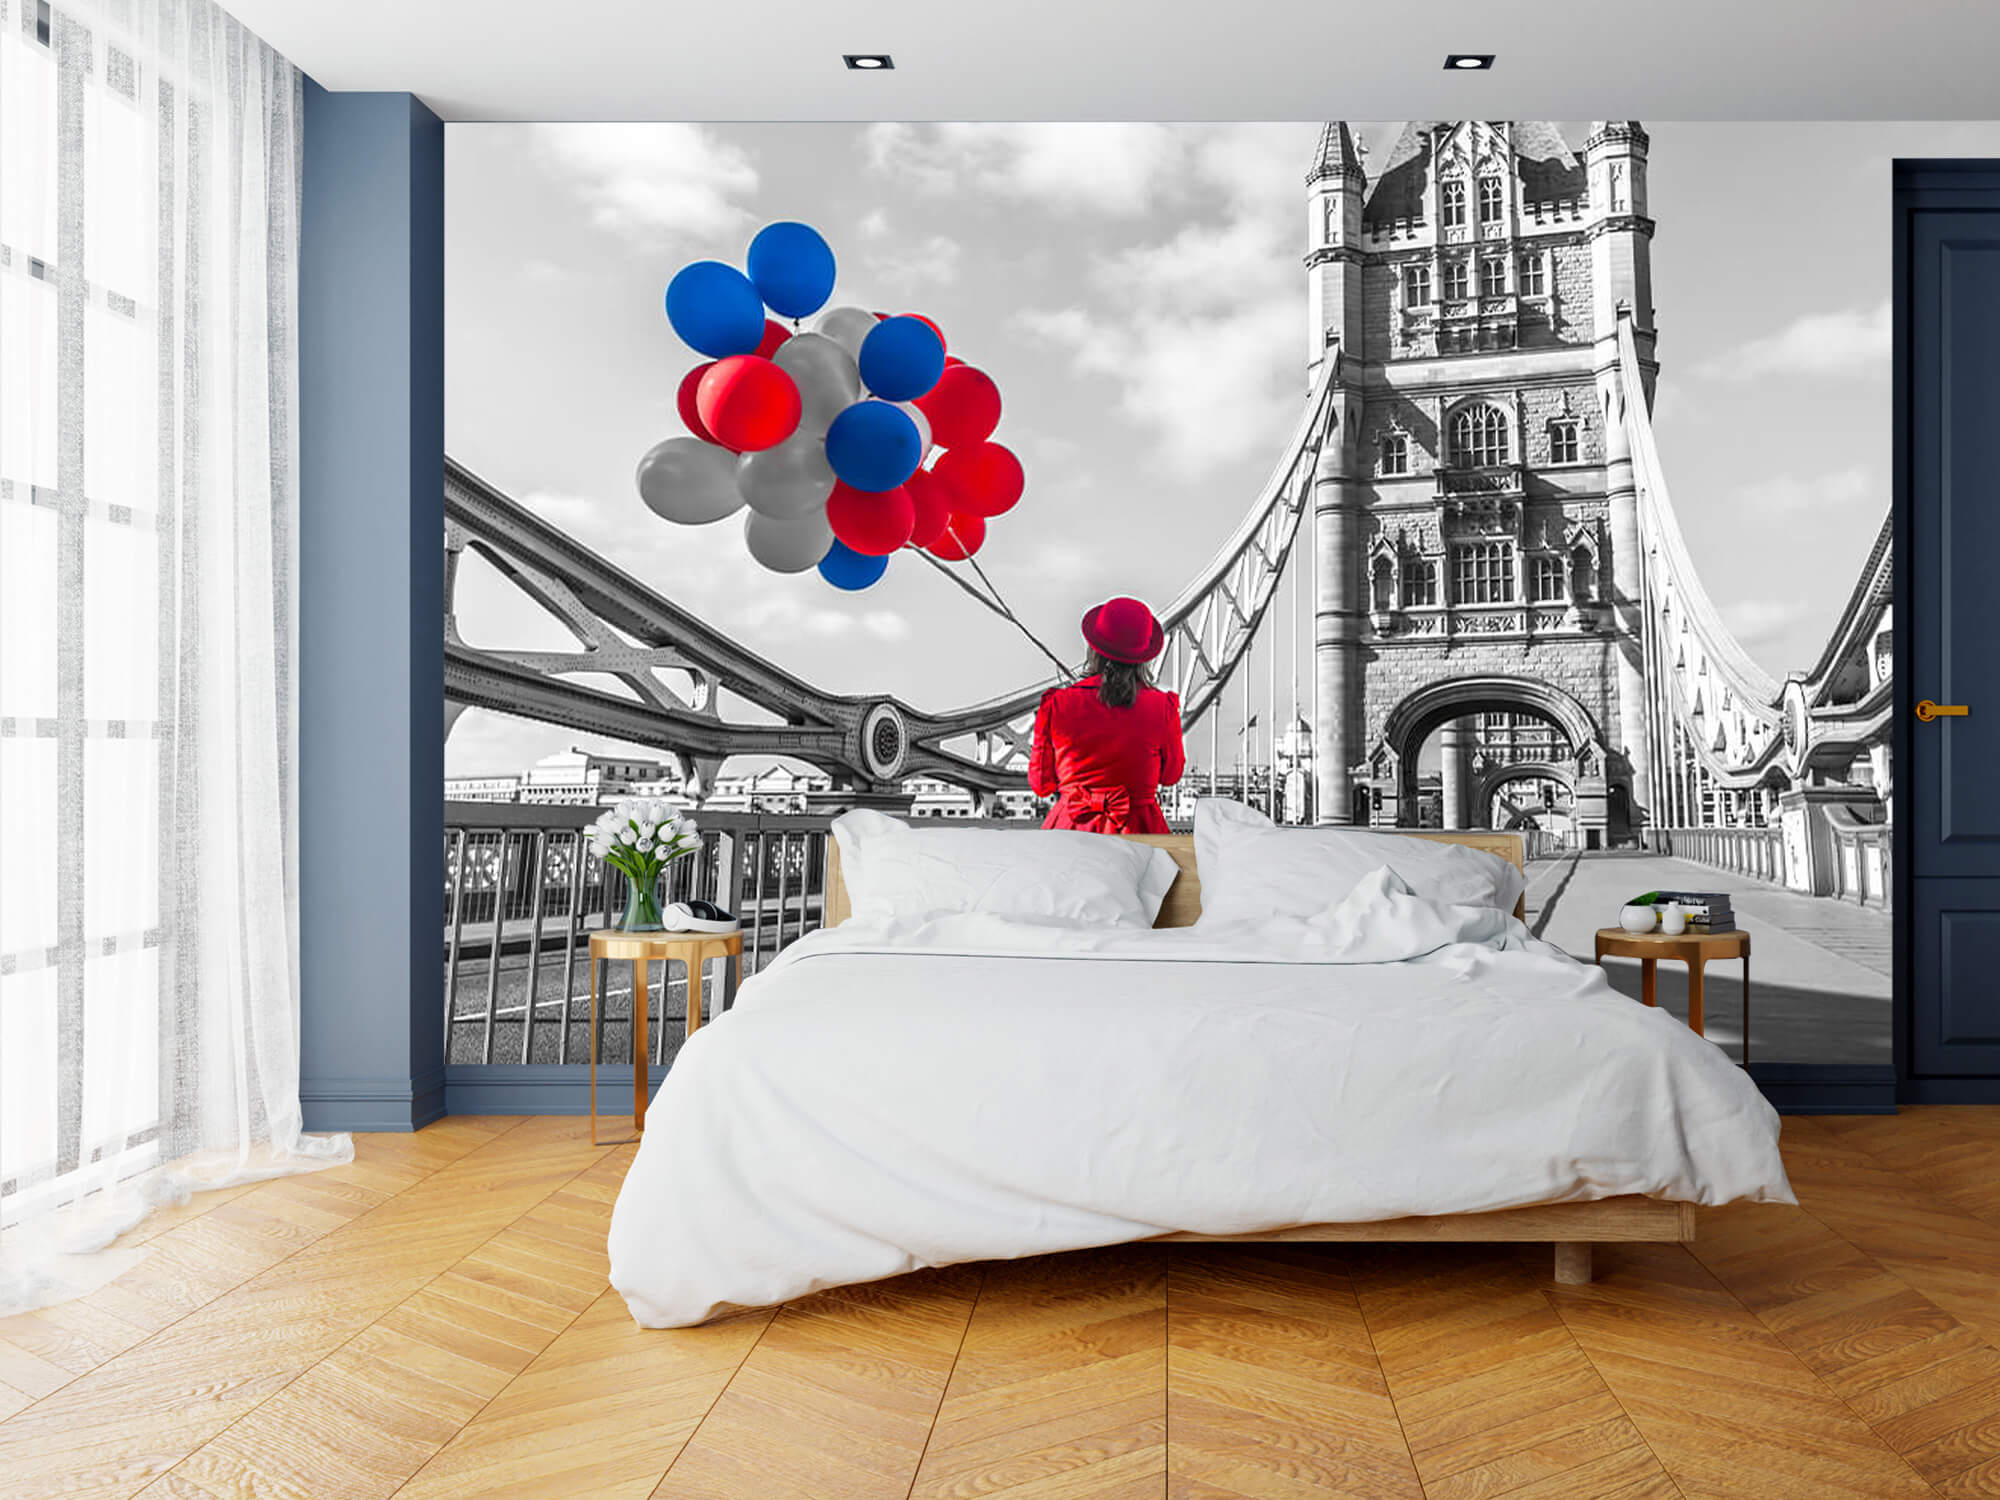 Kleurrijke ballonnen 8